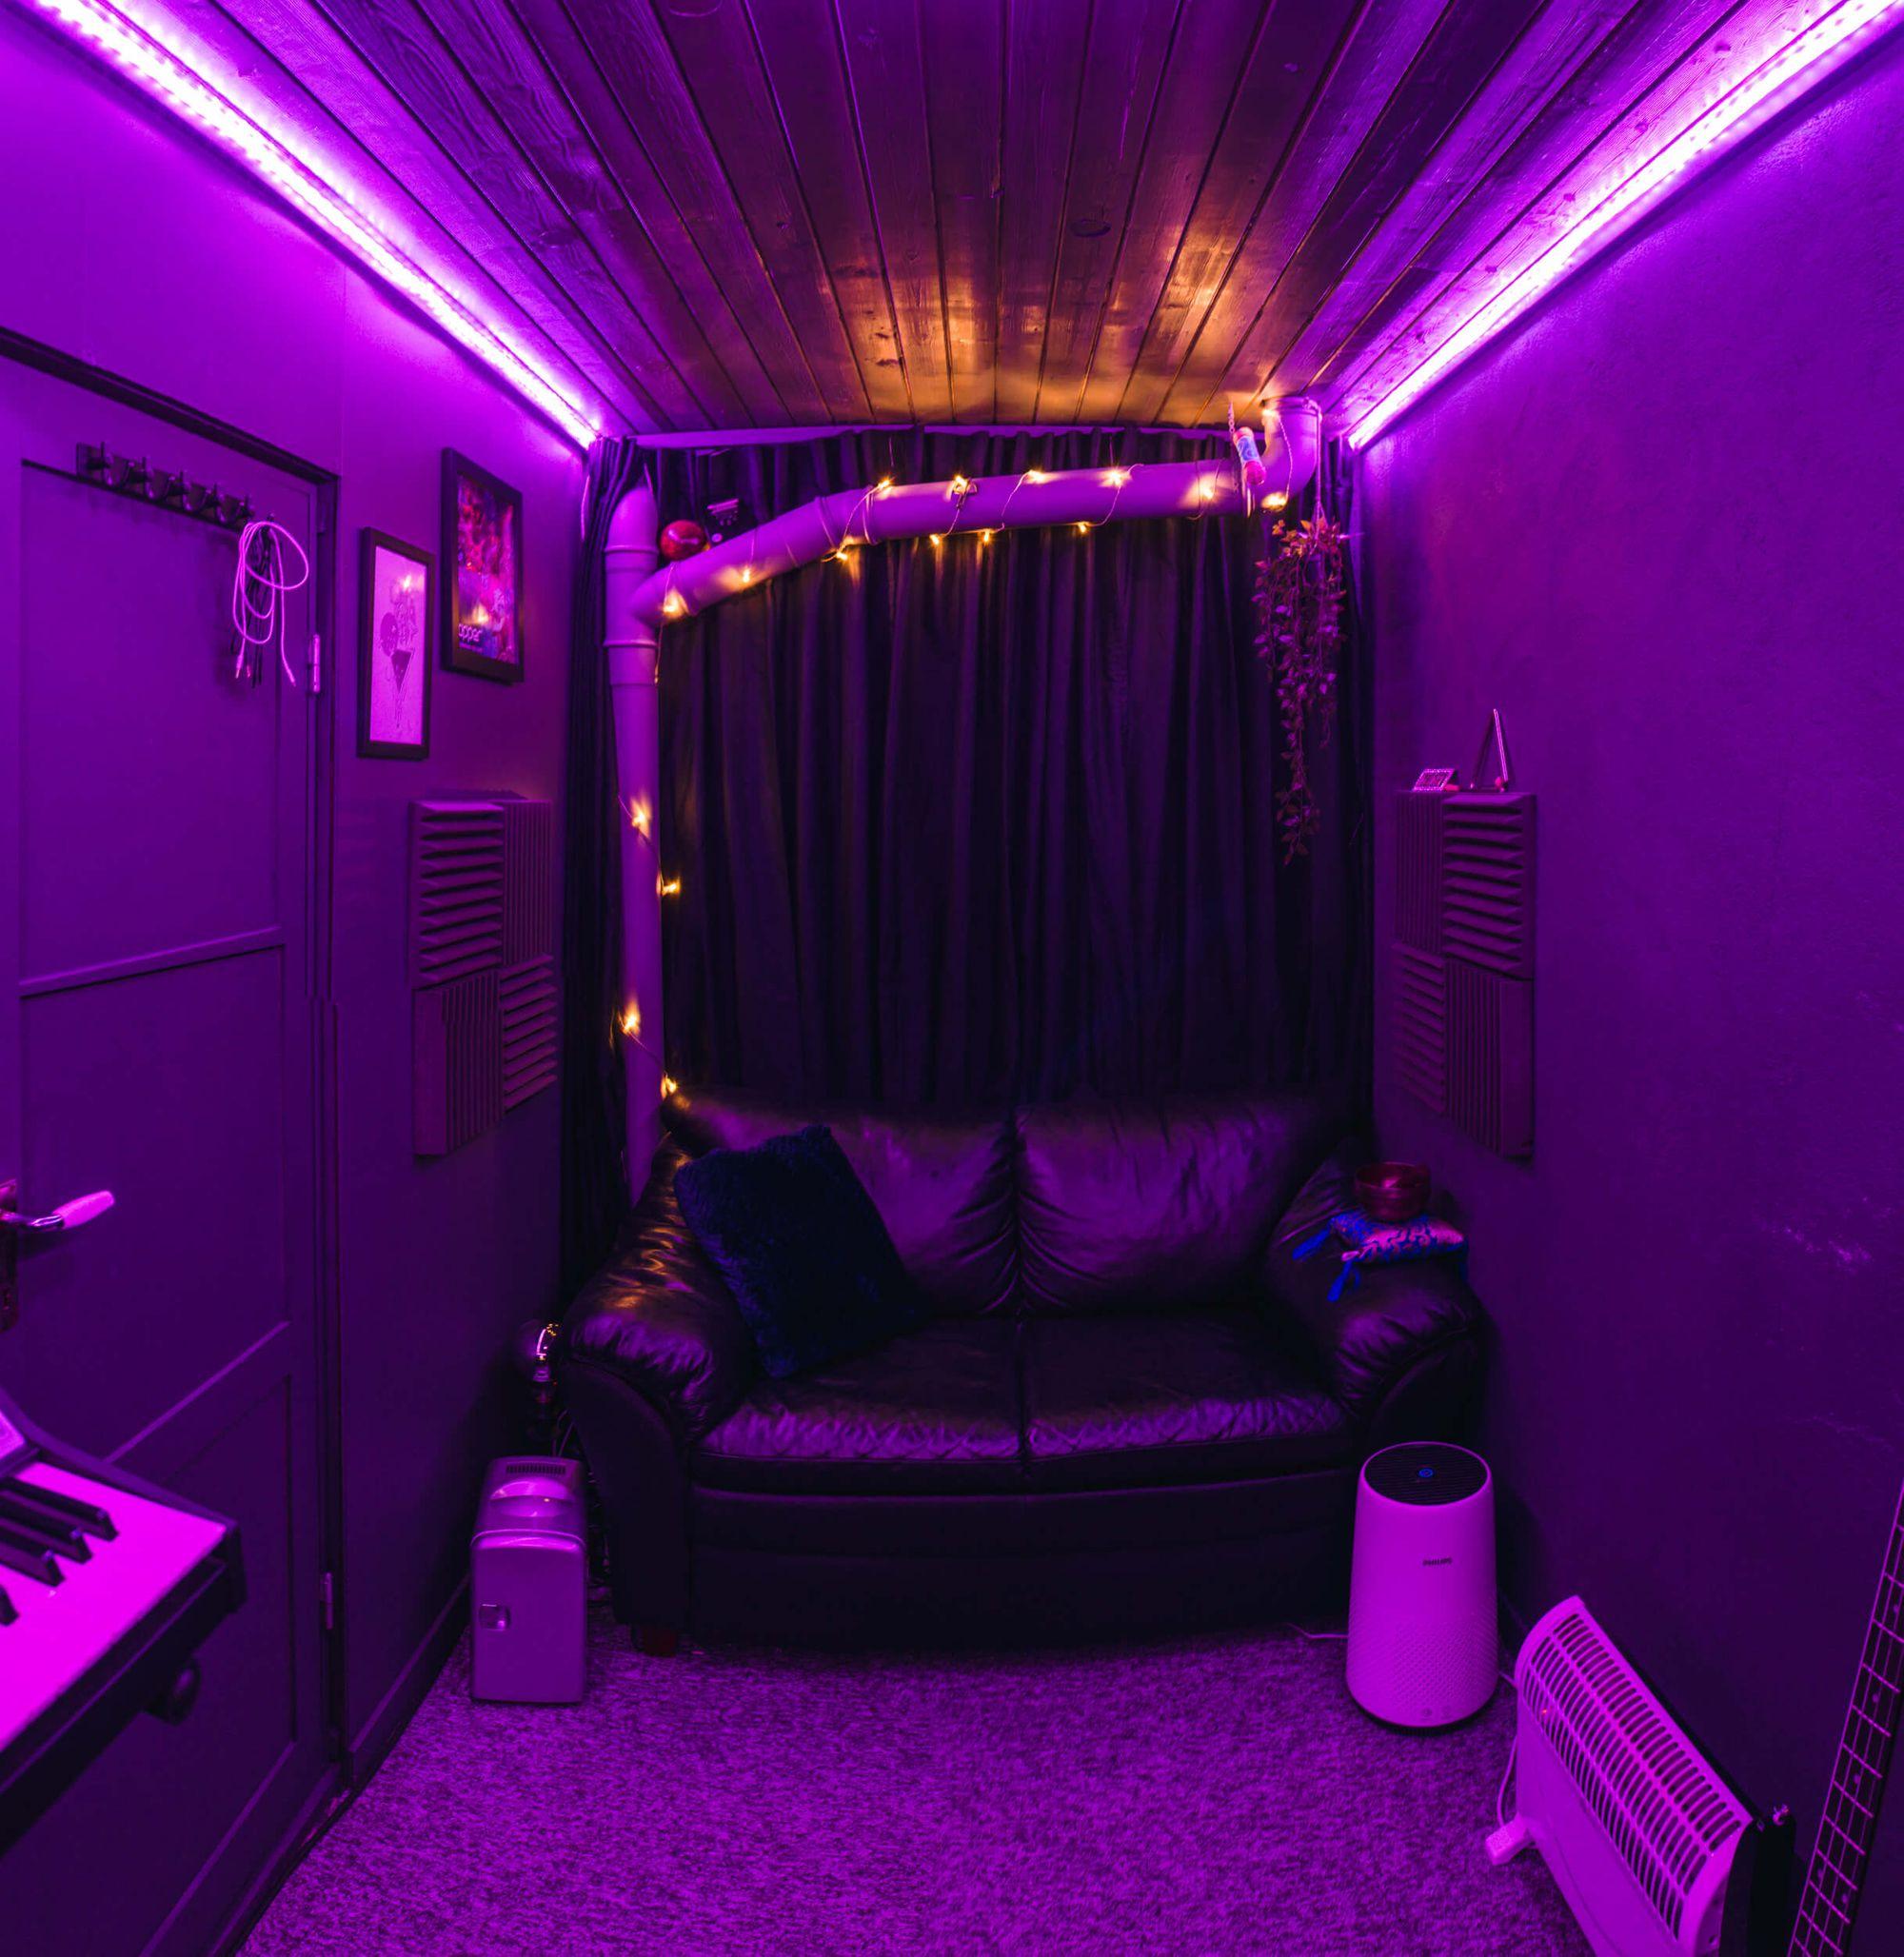 Violet-coloured lounge in Joakim's music studio